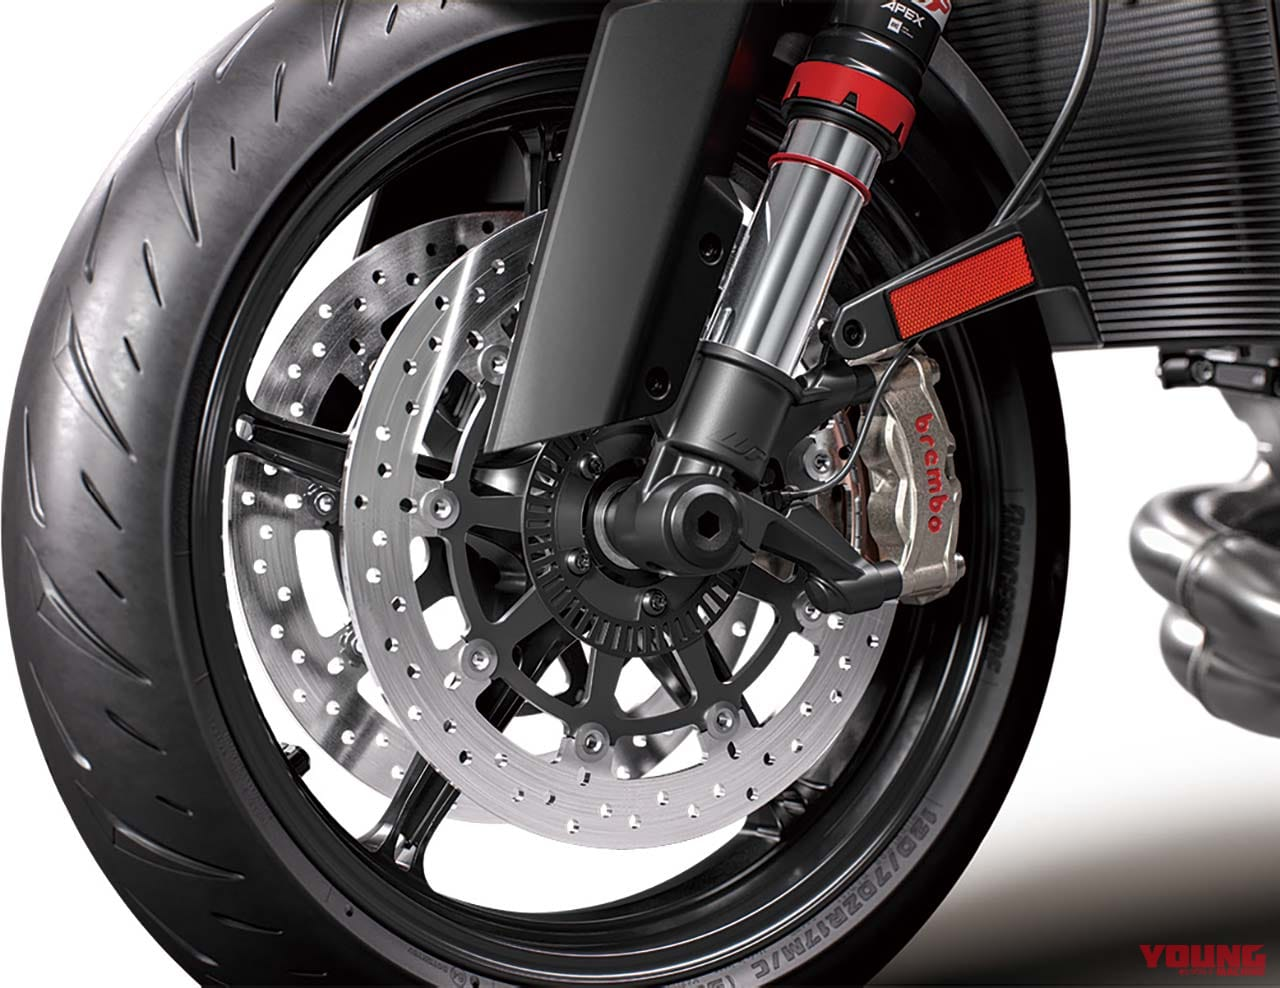 KTM 1290SDR